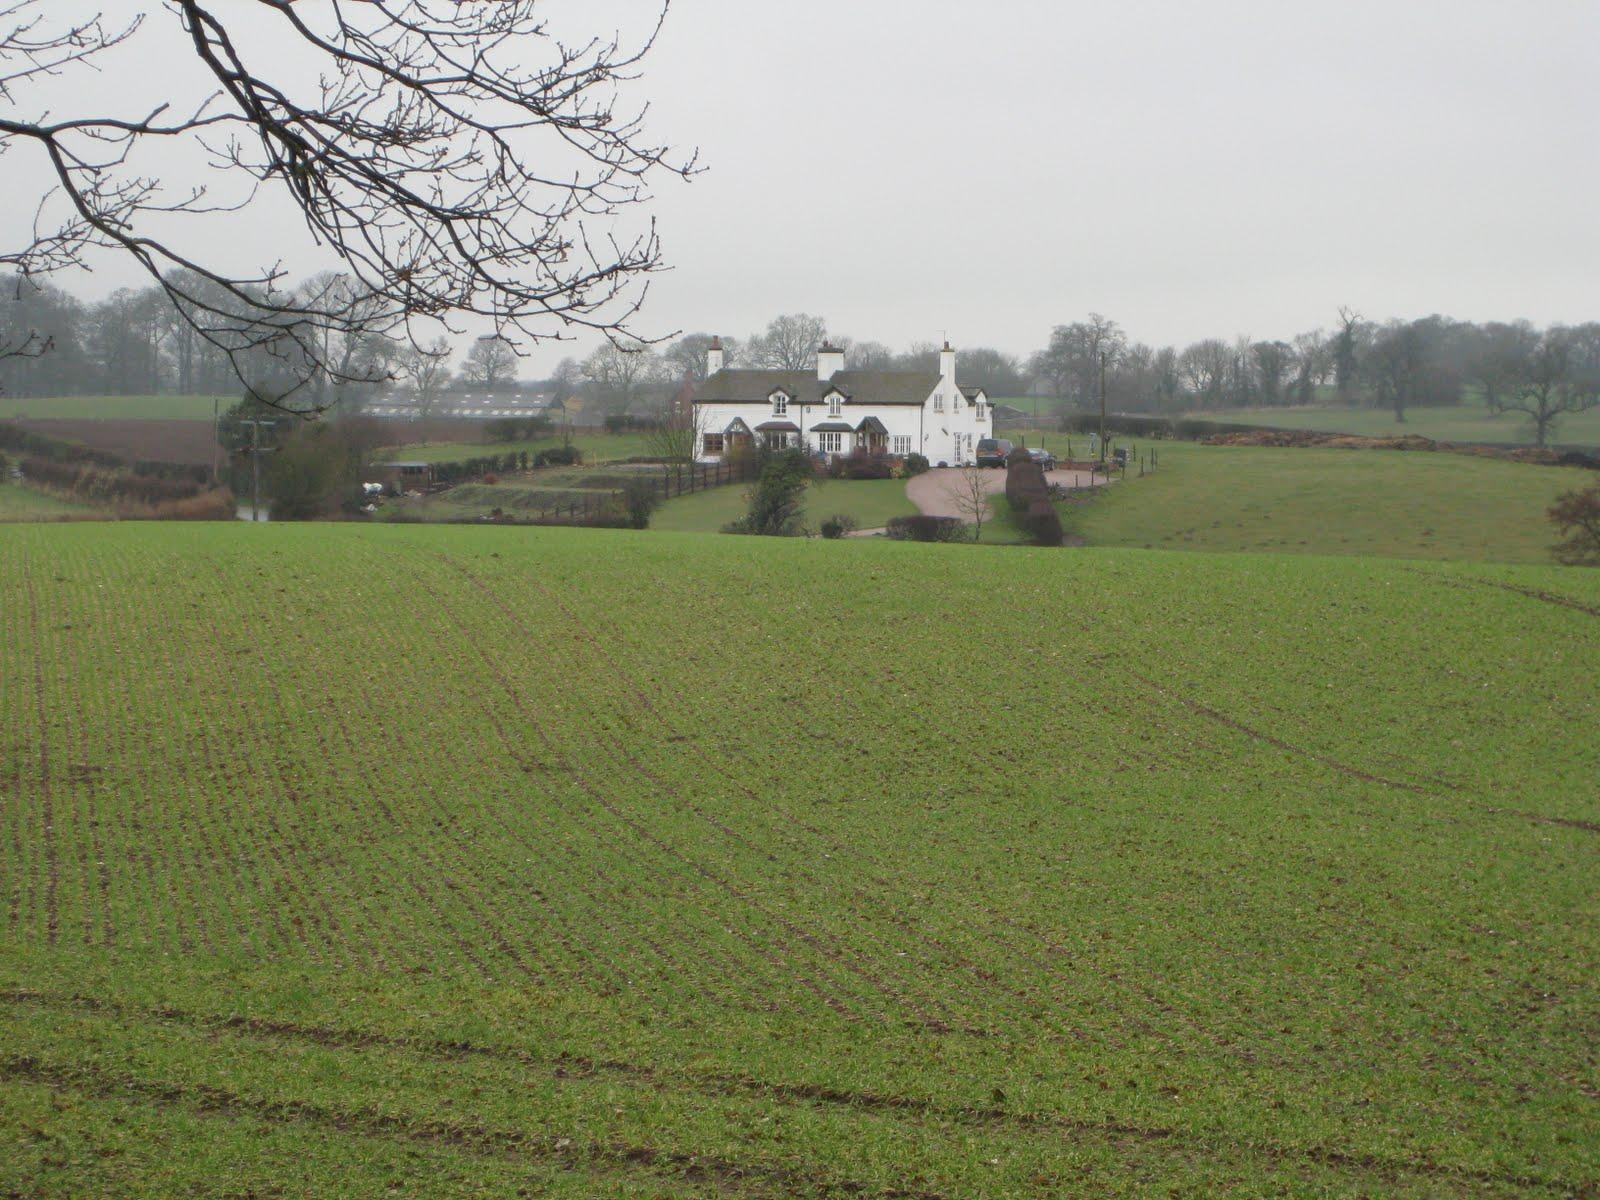 Farmland scene